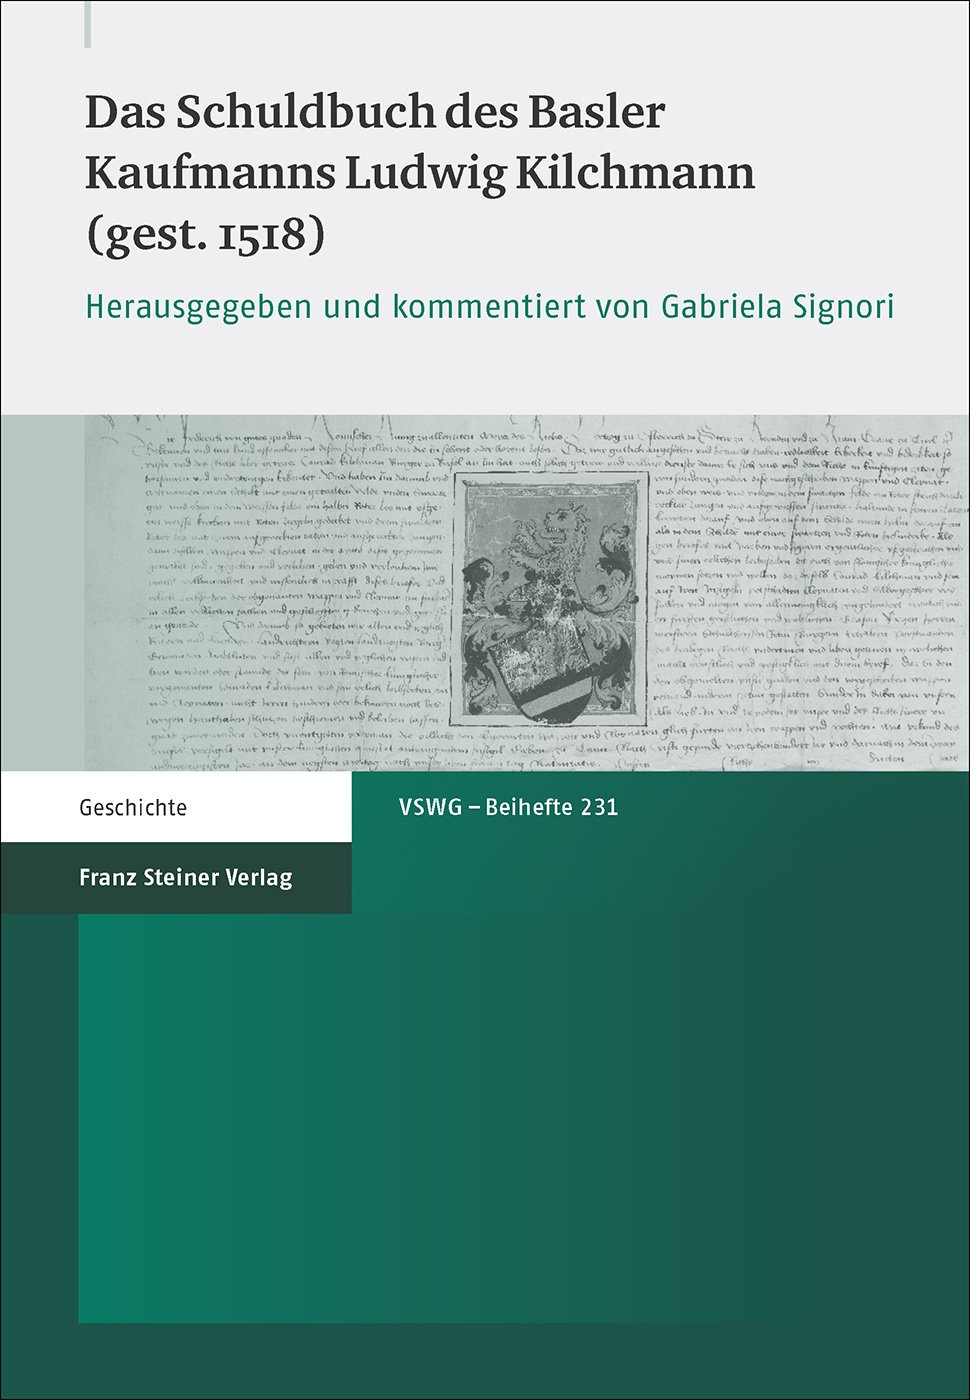 Das-Schuldbuch-des-Basler-Kaufmanns-Ludwig-Kilchmann-gest-1518-Gabriela